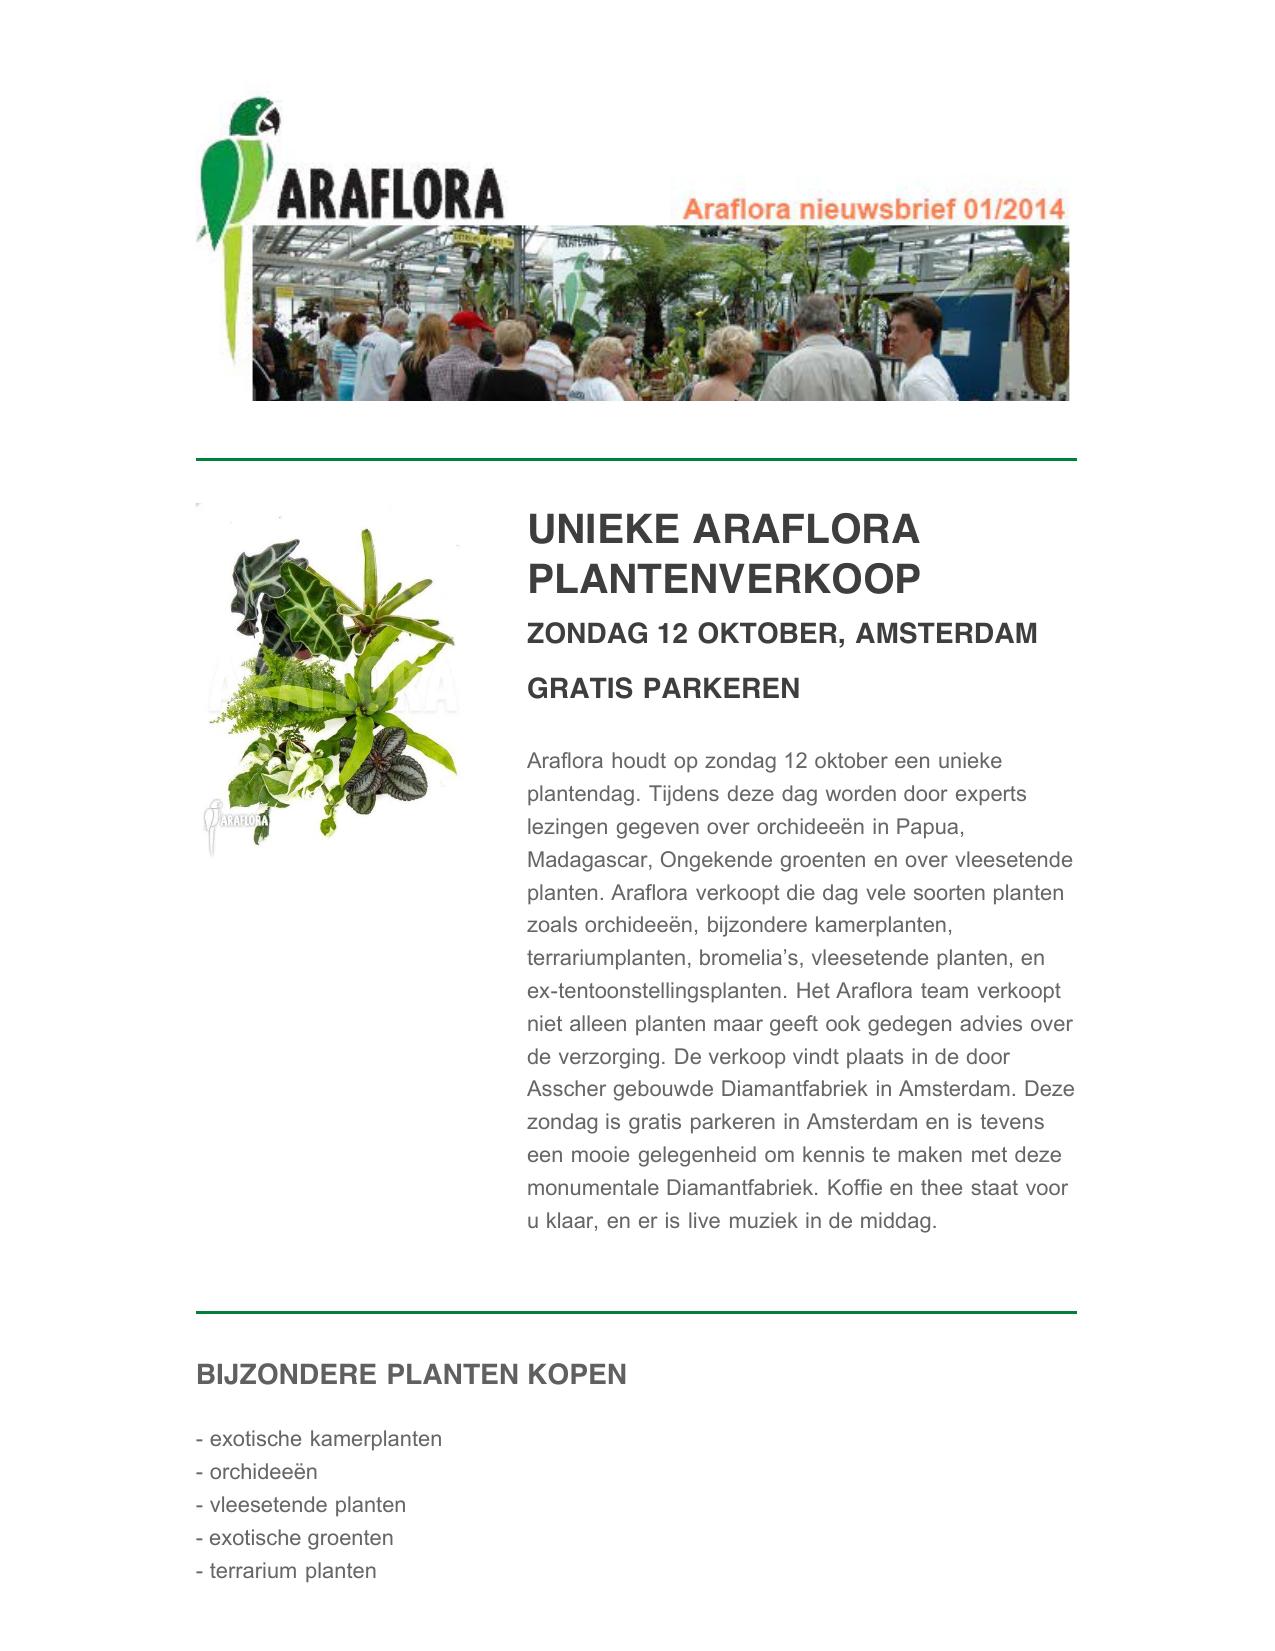 Kamerplanten Kopen Amsterdam.Unieke Araflora Plantenverkoop